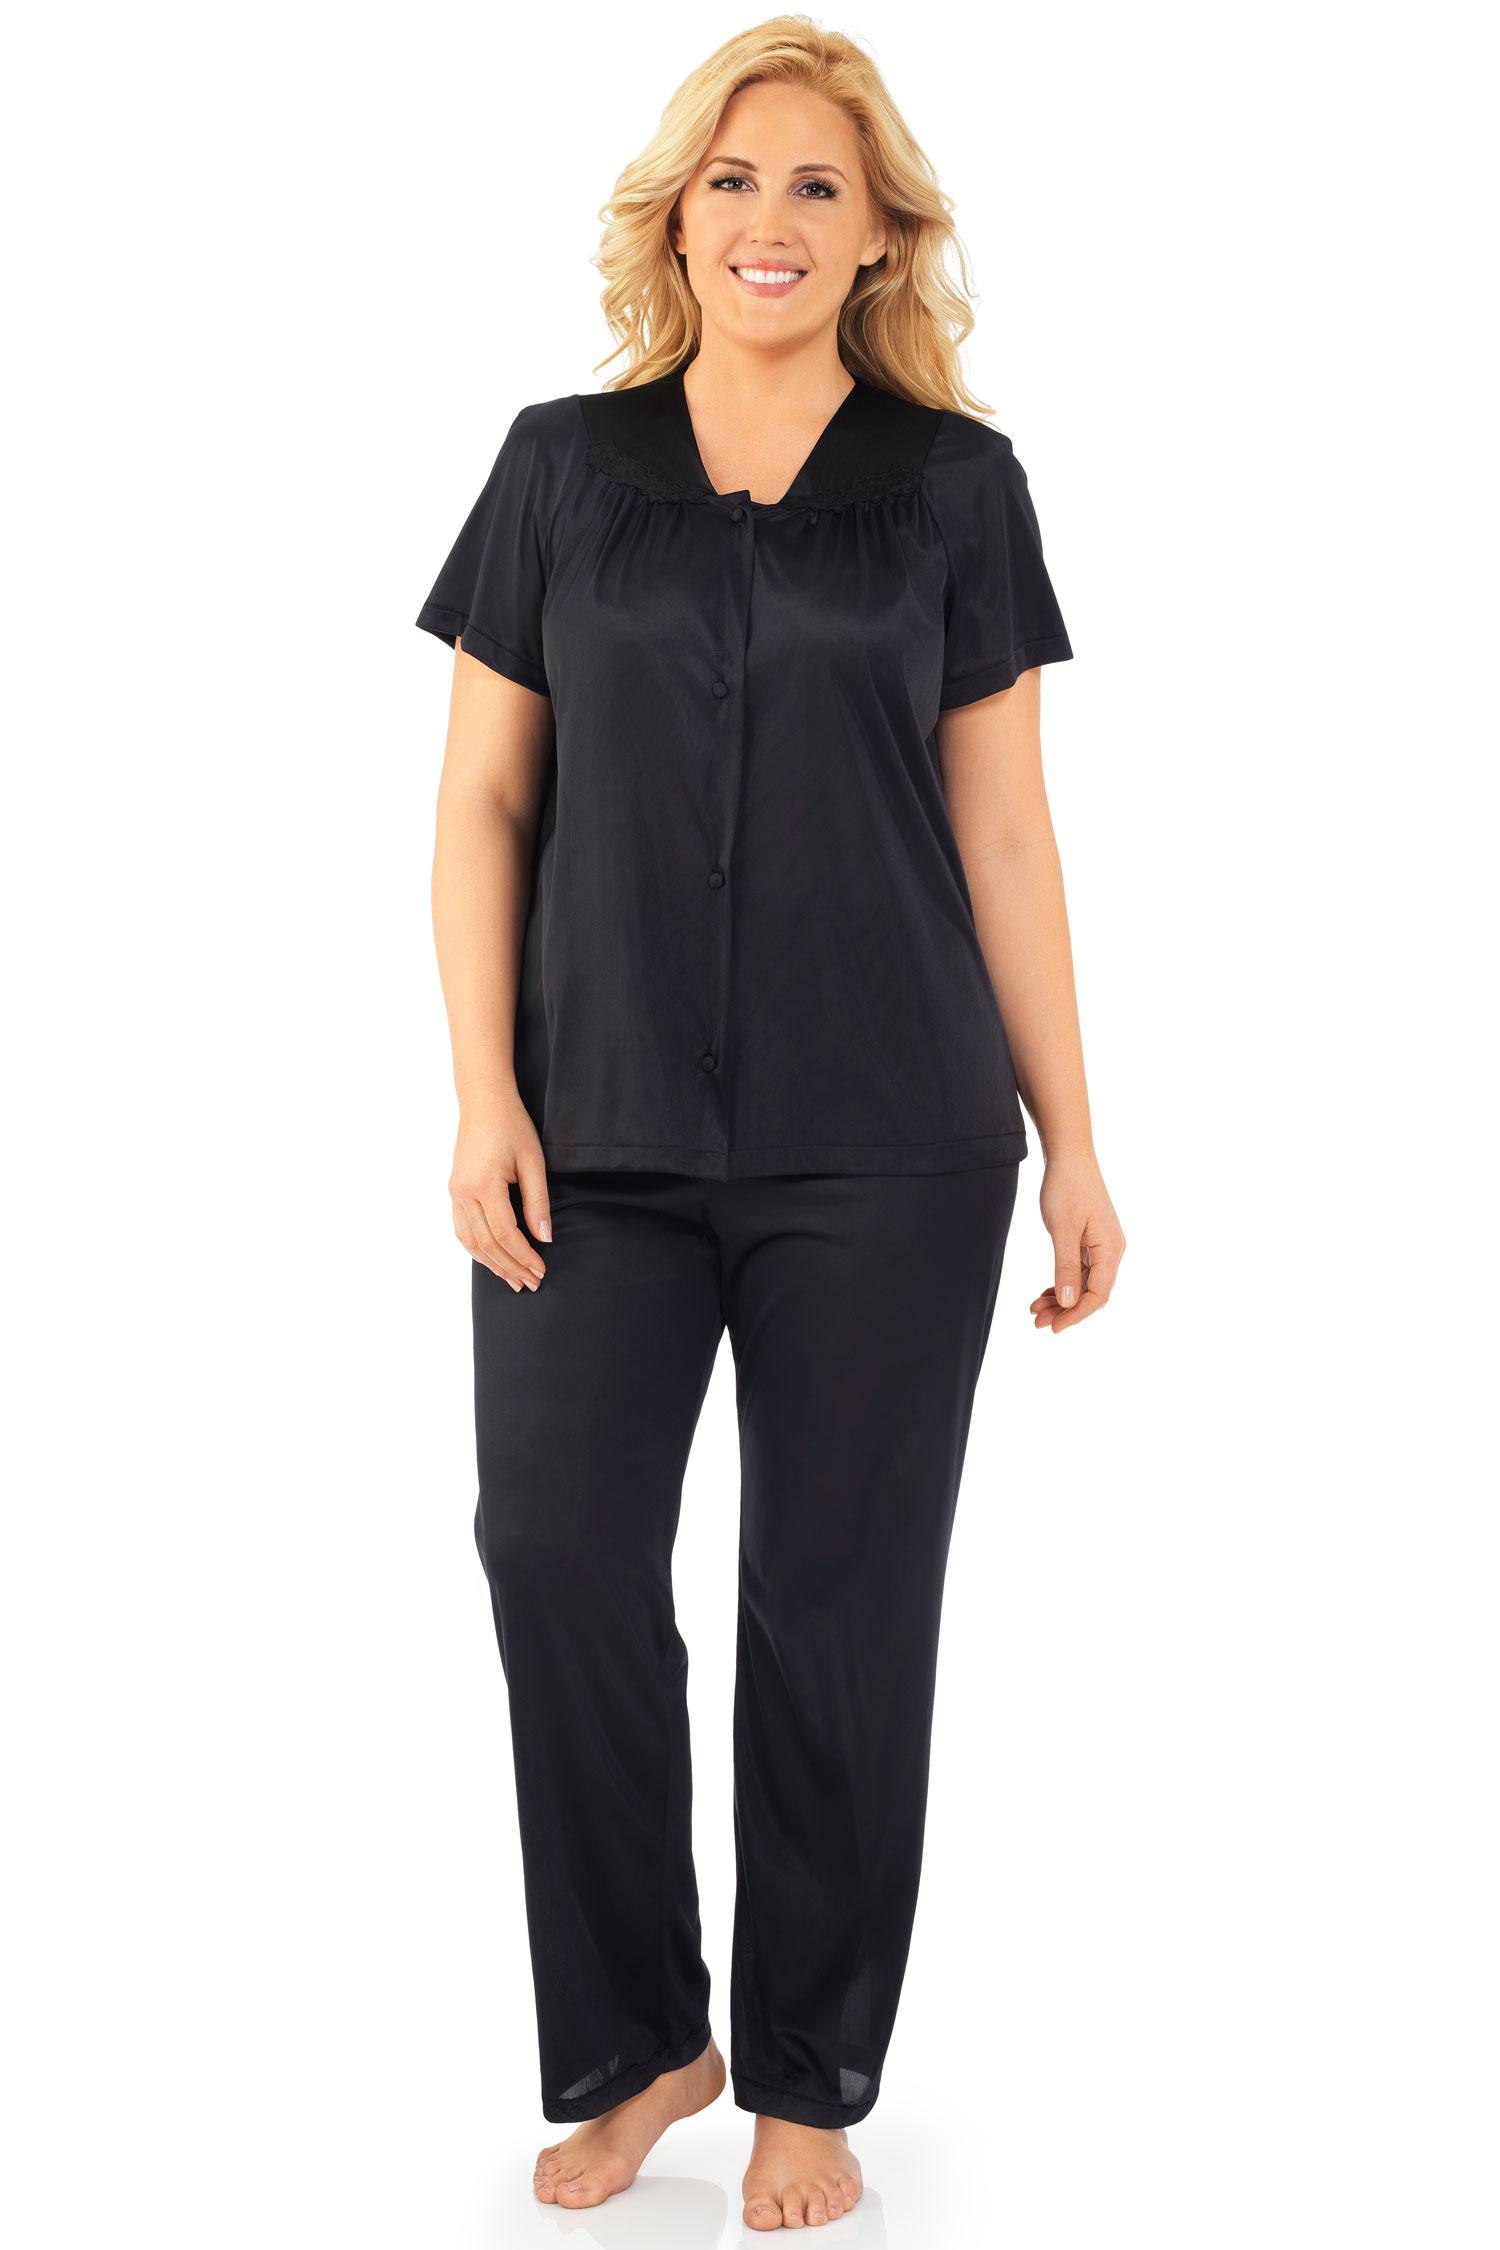 Exquisite Form Short Sleeve Pajama Black - 1X 90107/90807